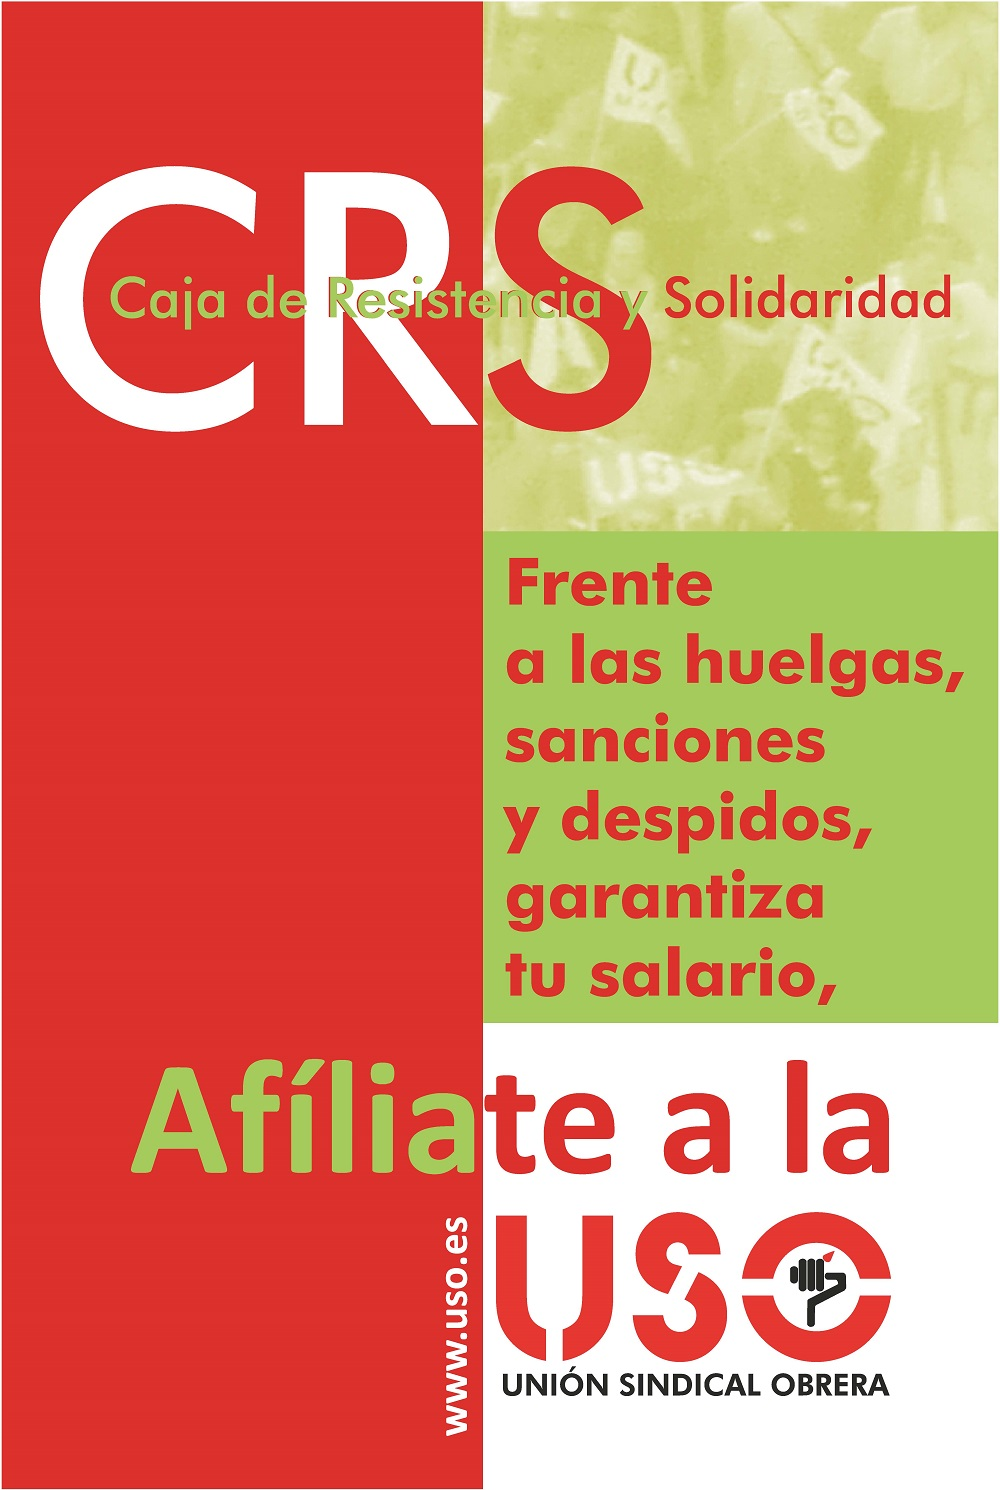 cartel-crs-2012